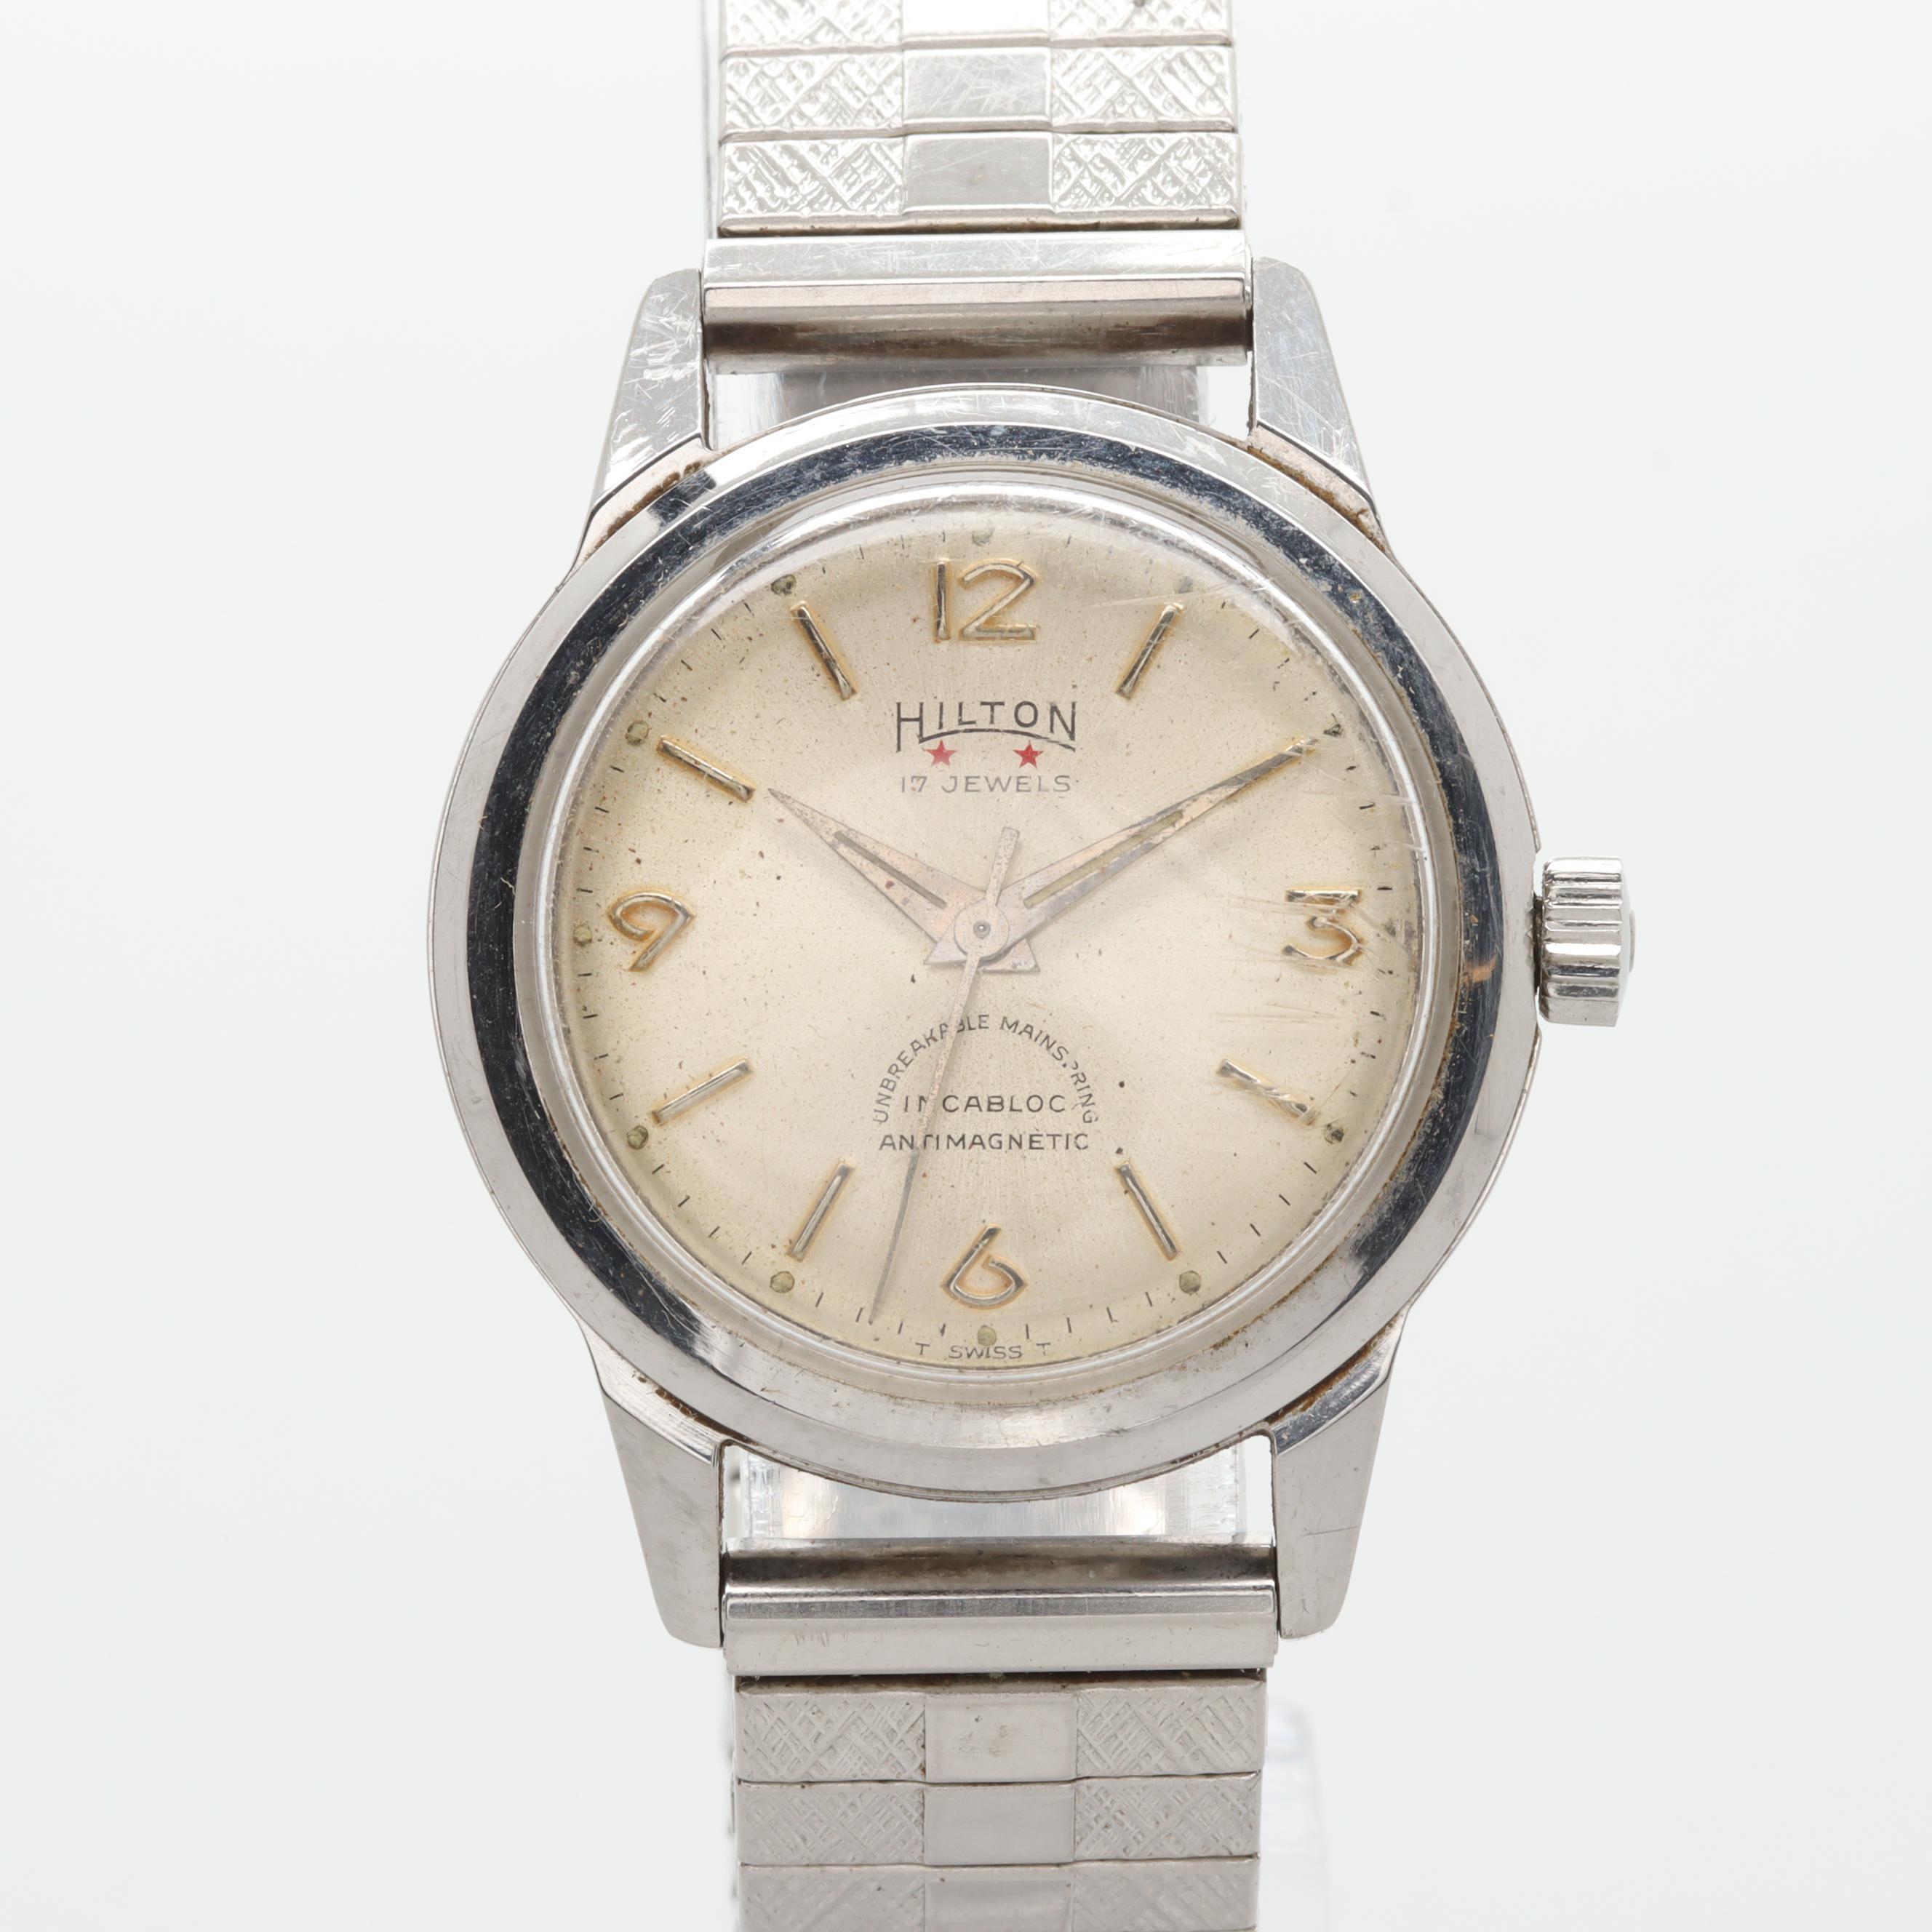 Vintage Hilton Swiss Stem Wind Wristwatch